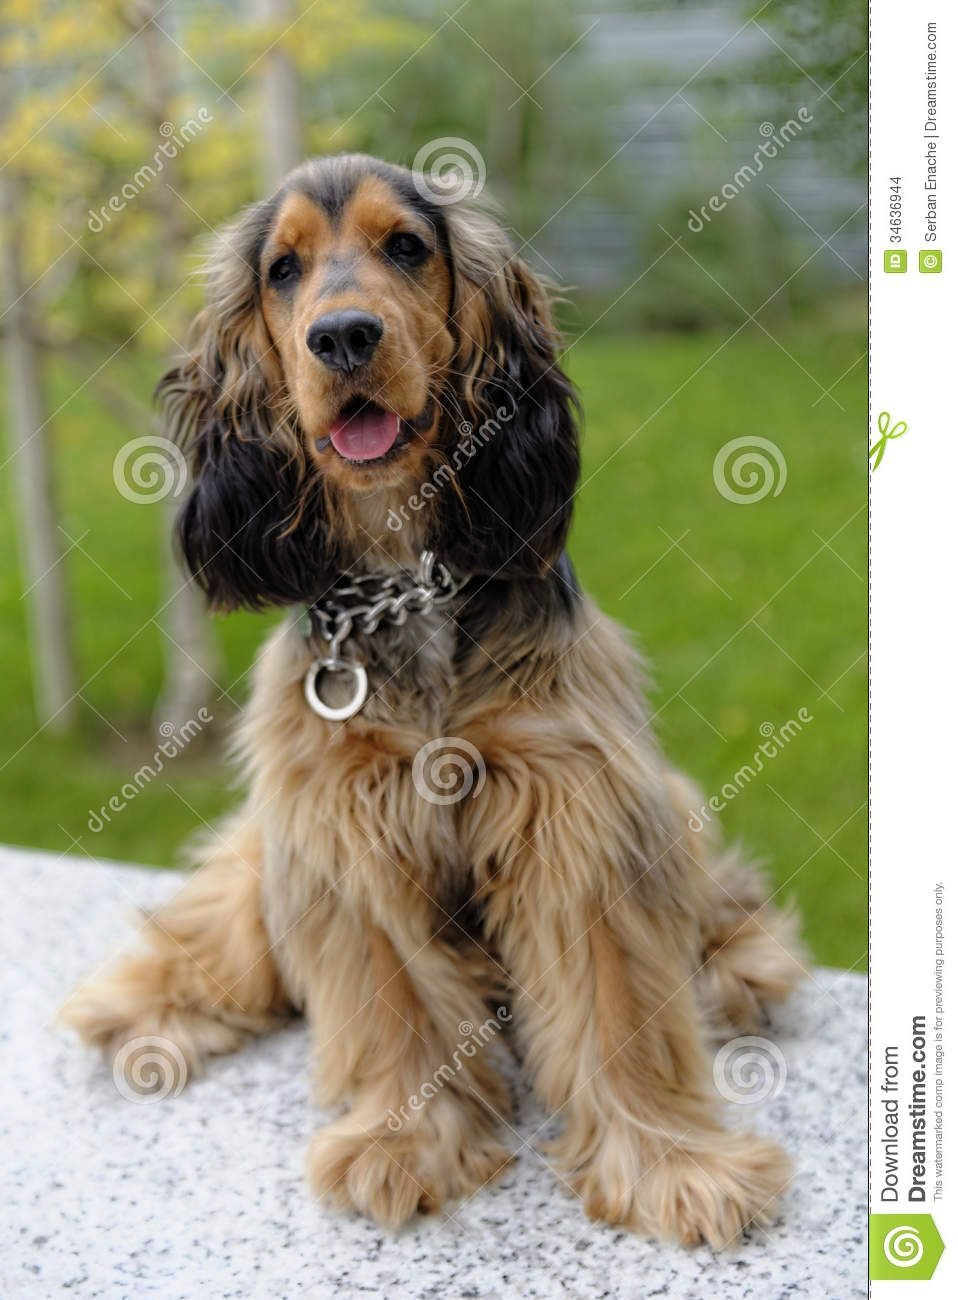 English Cocker Spaniel Black Sable My Puppy Looks Exactly Like